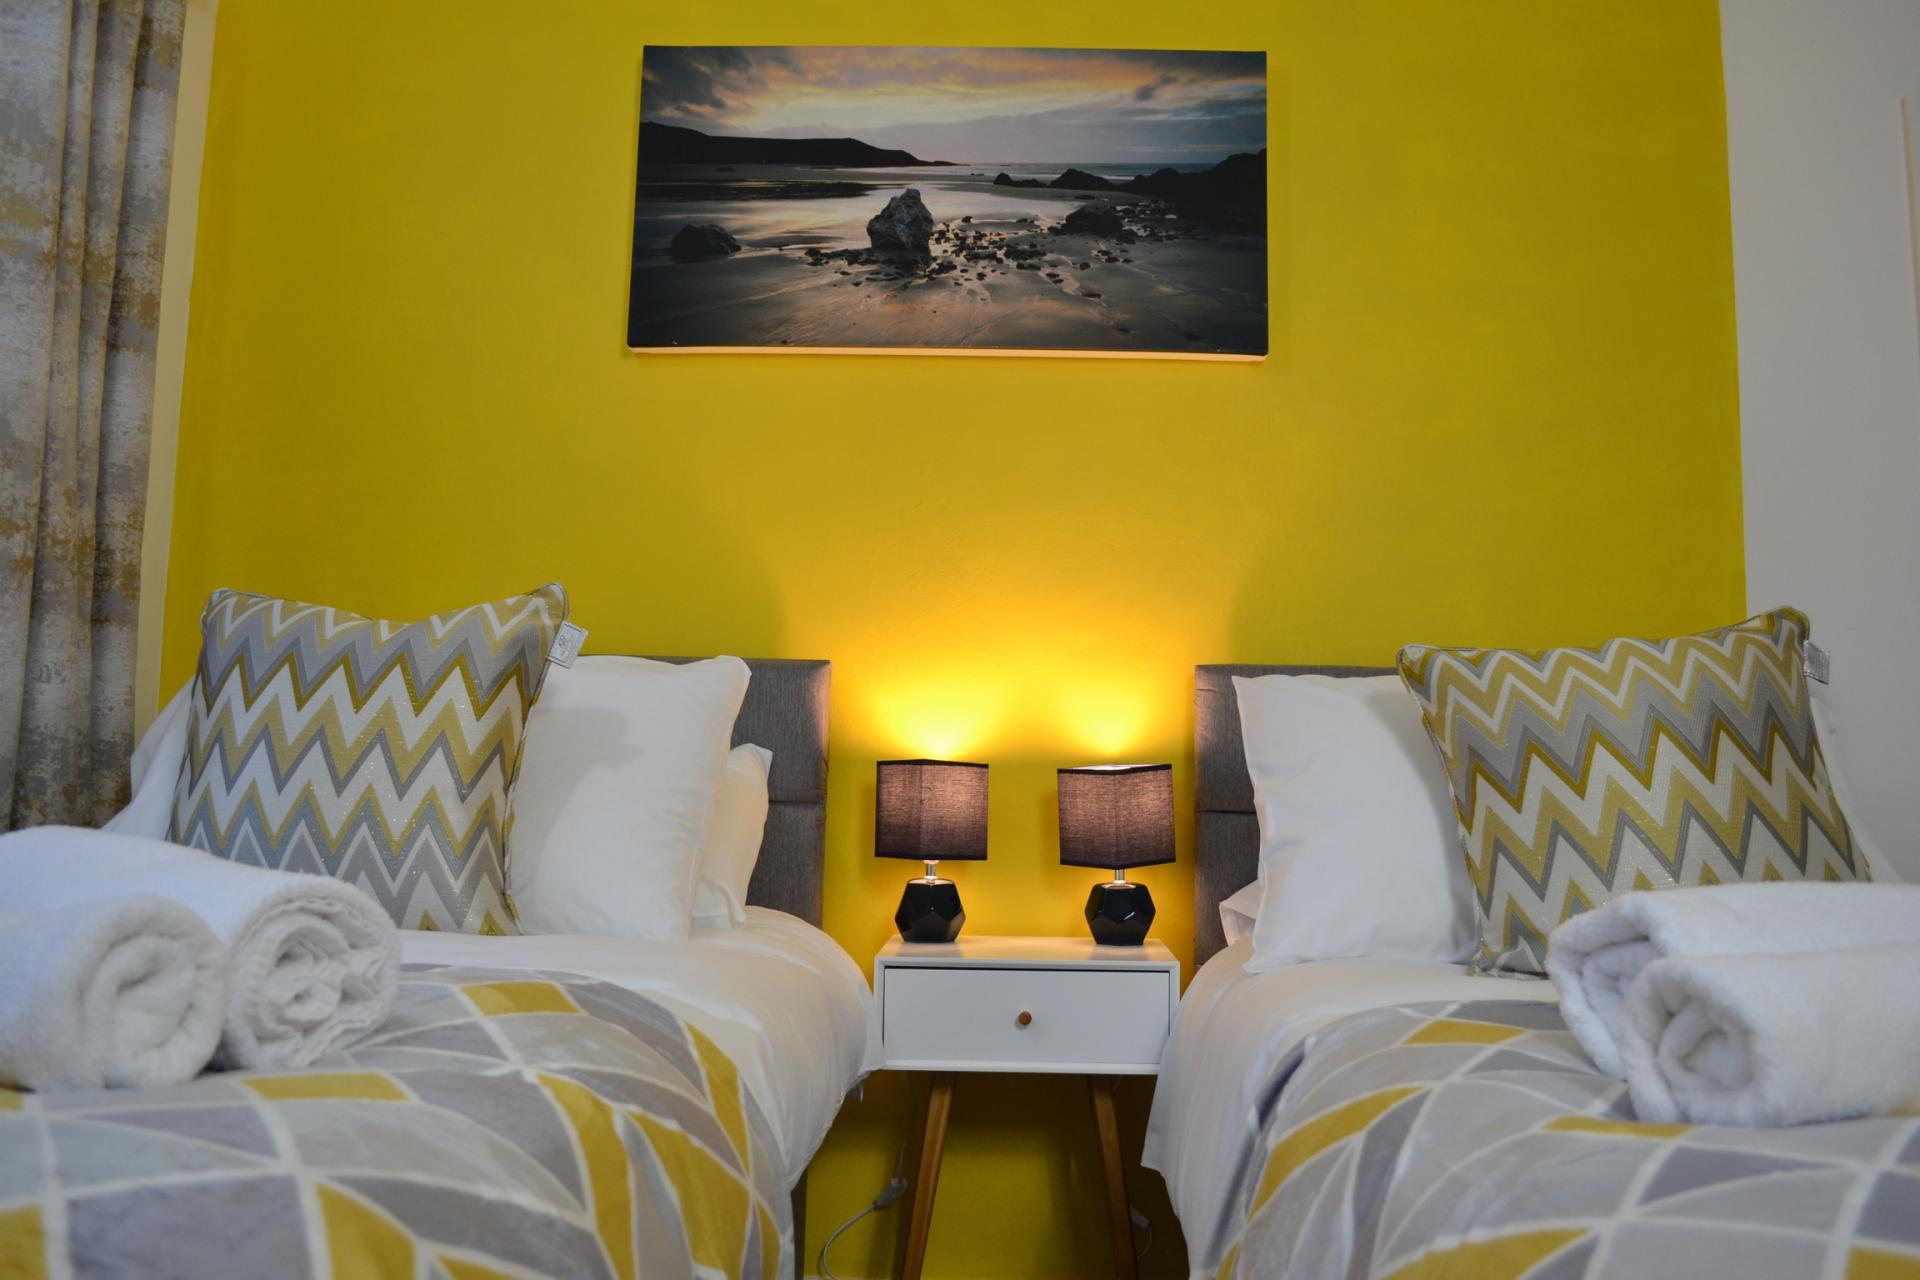 Bedroom at Kendal Way Home, Chesterton, Cambridge - Citybase Apartments